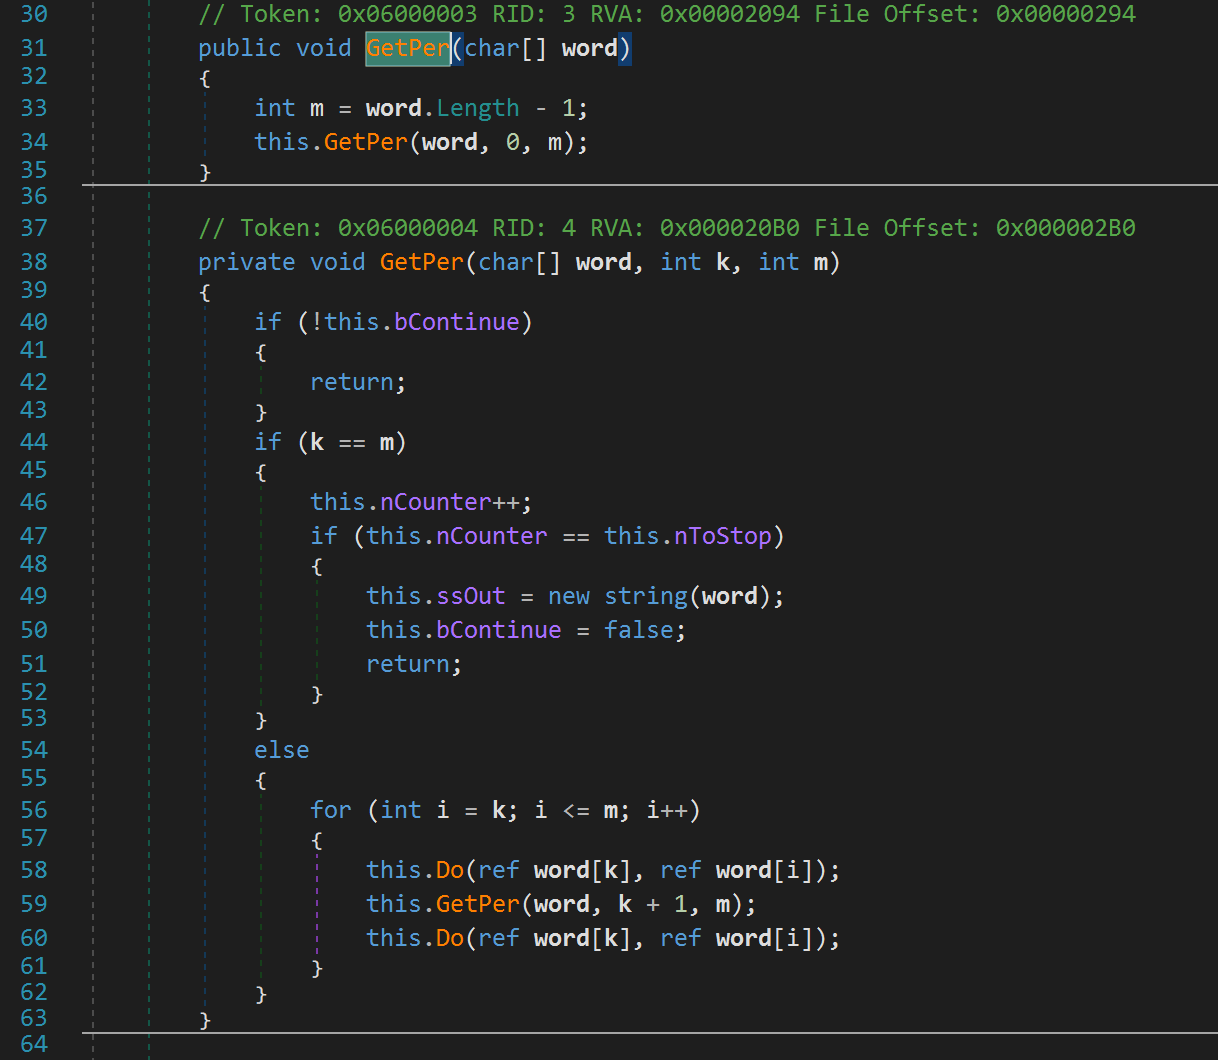 GetPer function